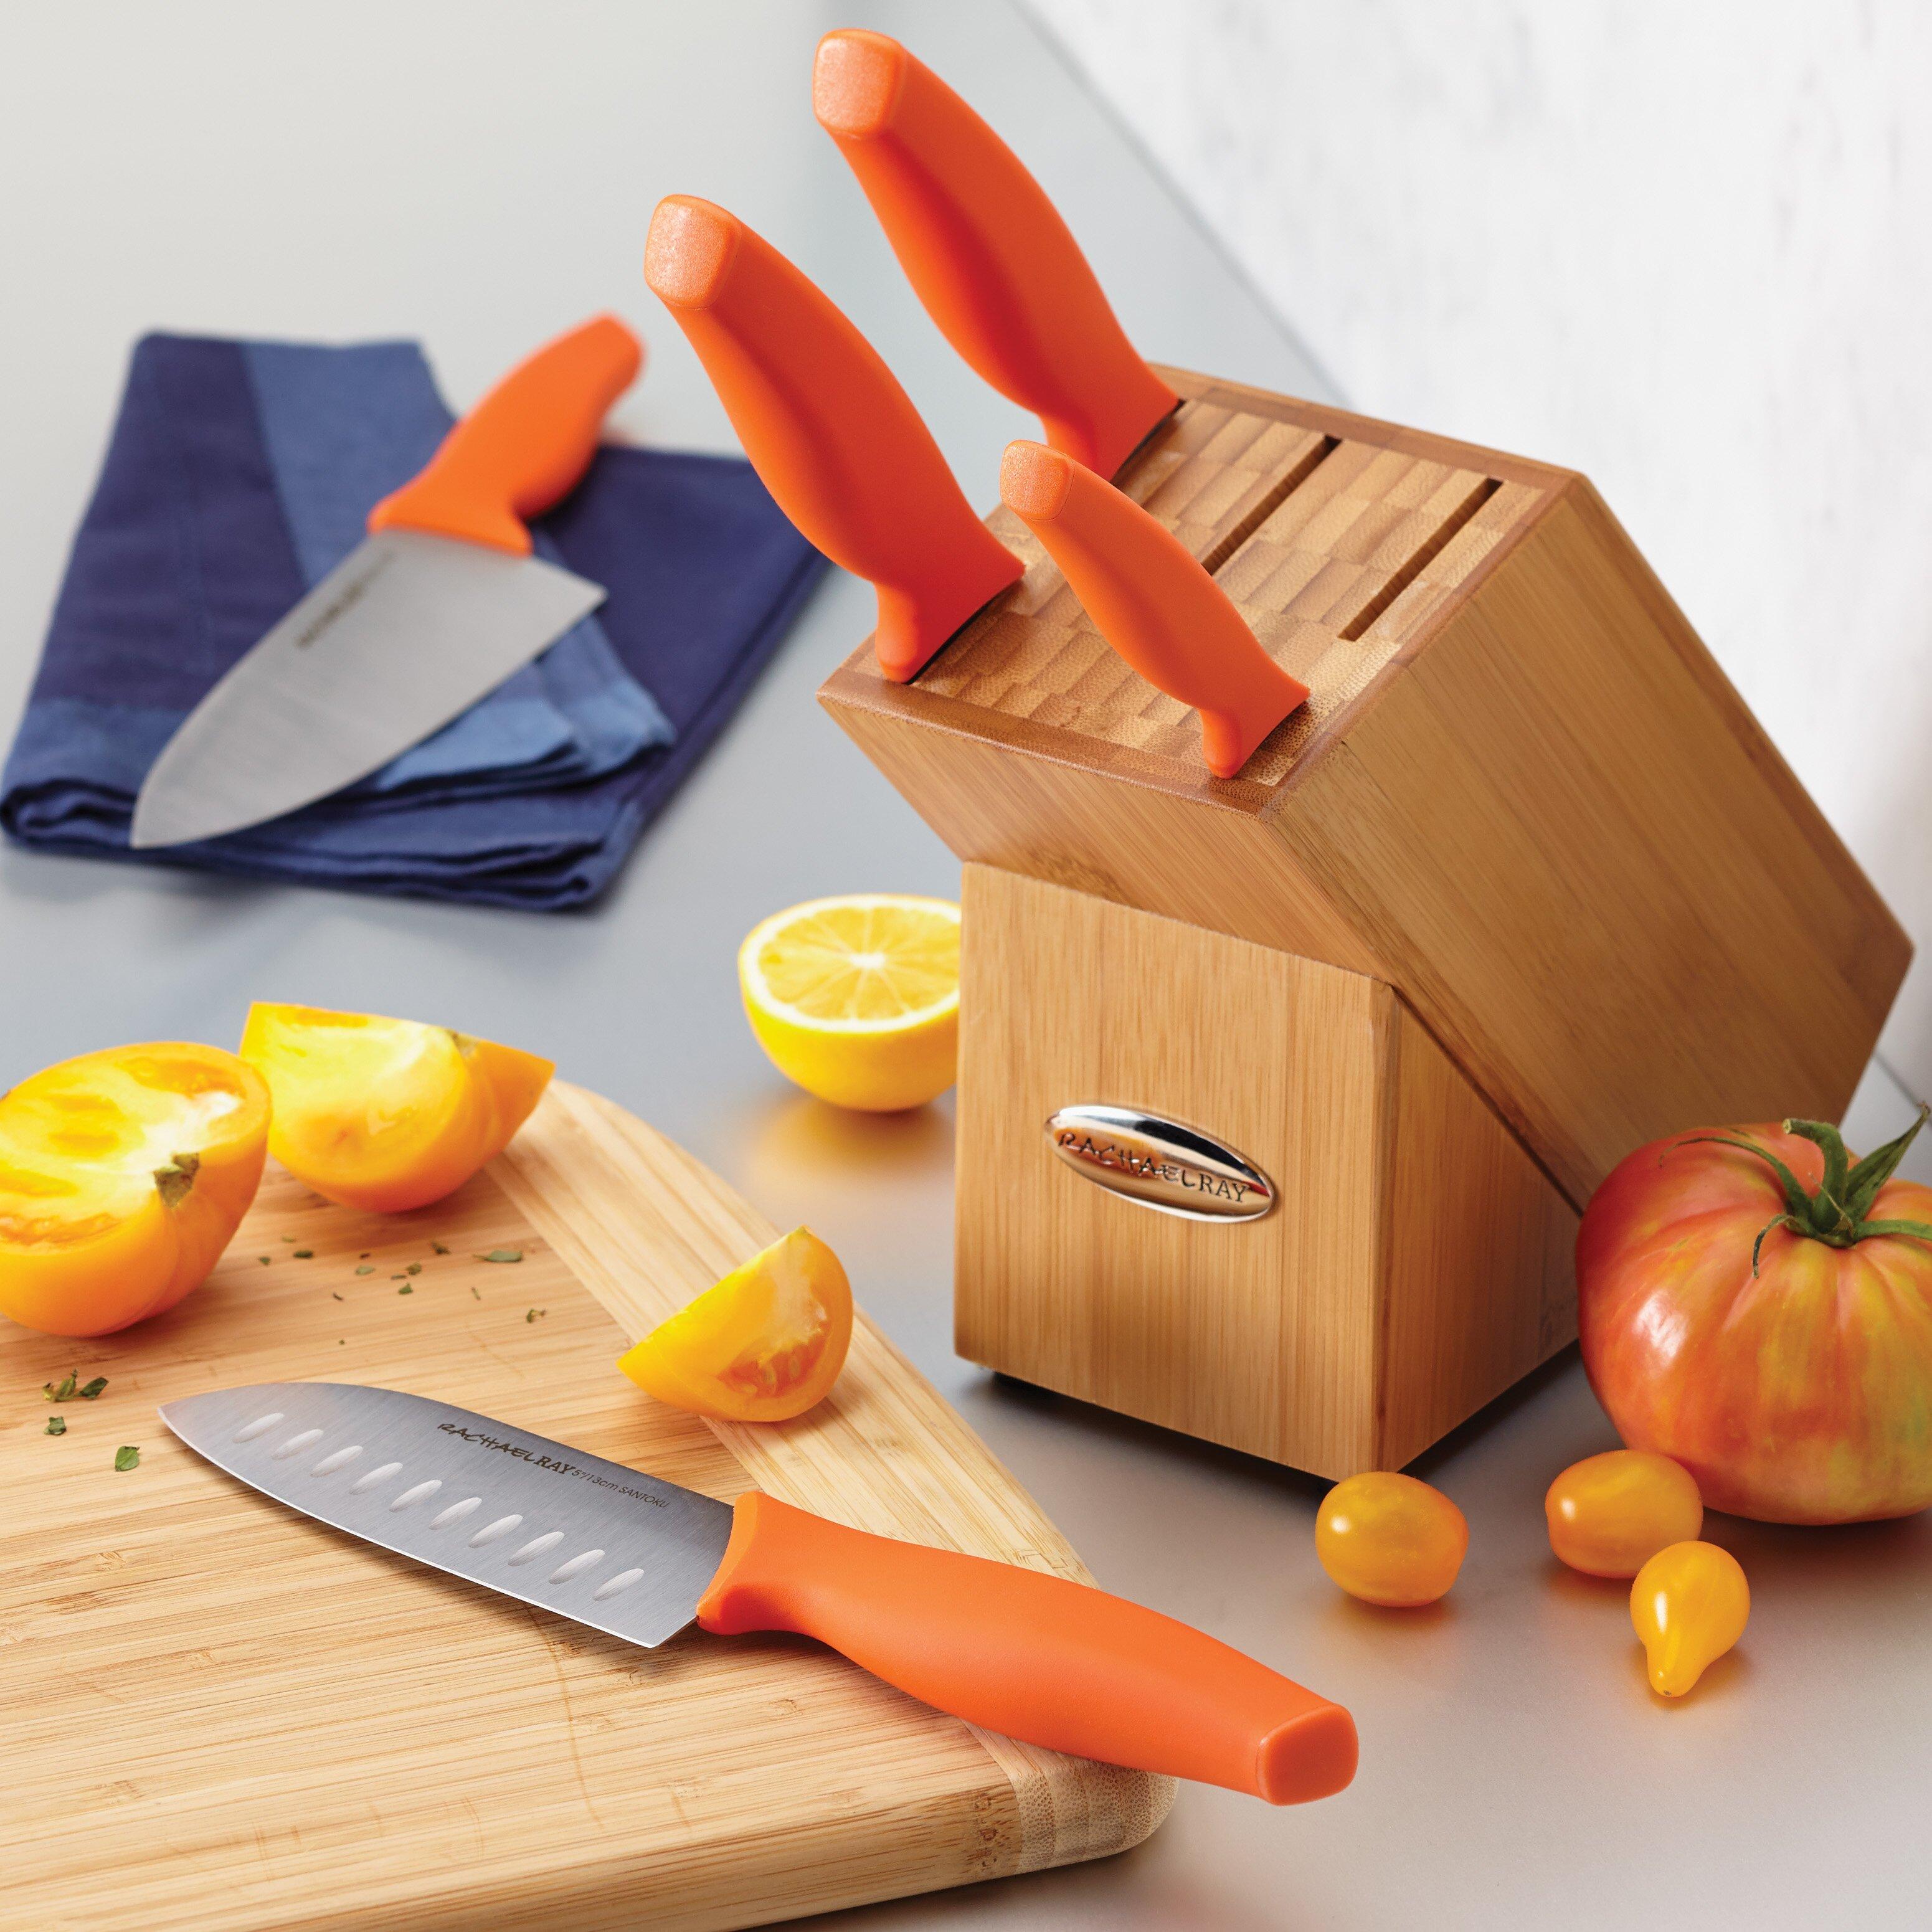 Uncategorized Rachael Ray Kitchen Appliances rachael ray 3 piece carving knife set reviews wayfair wayfair